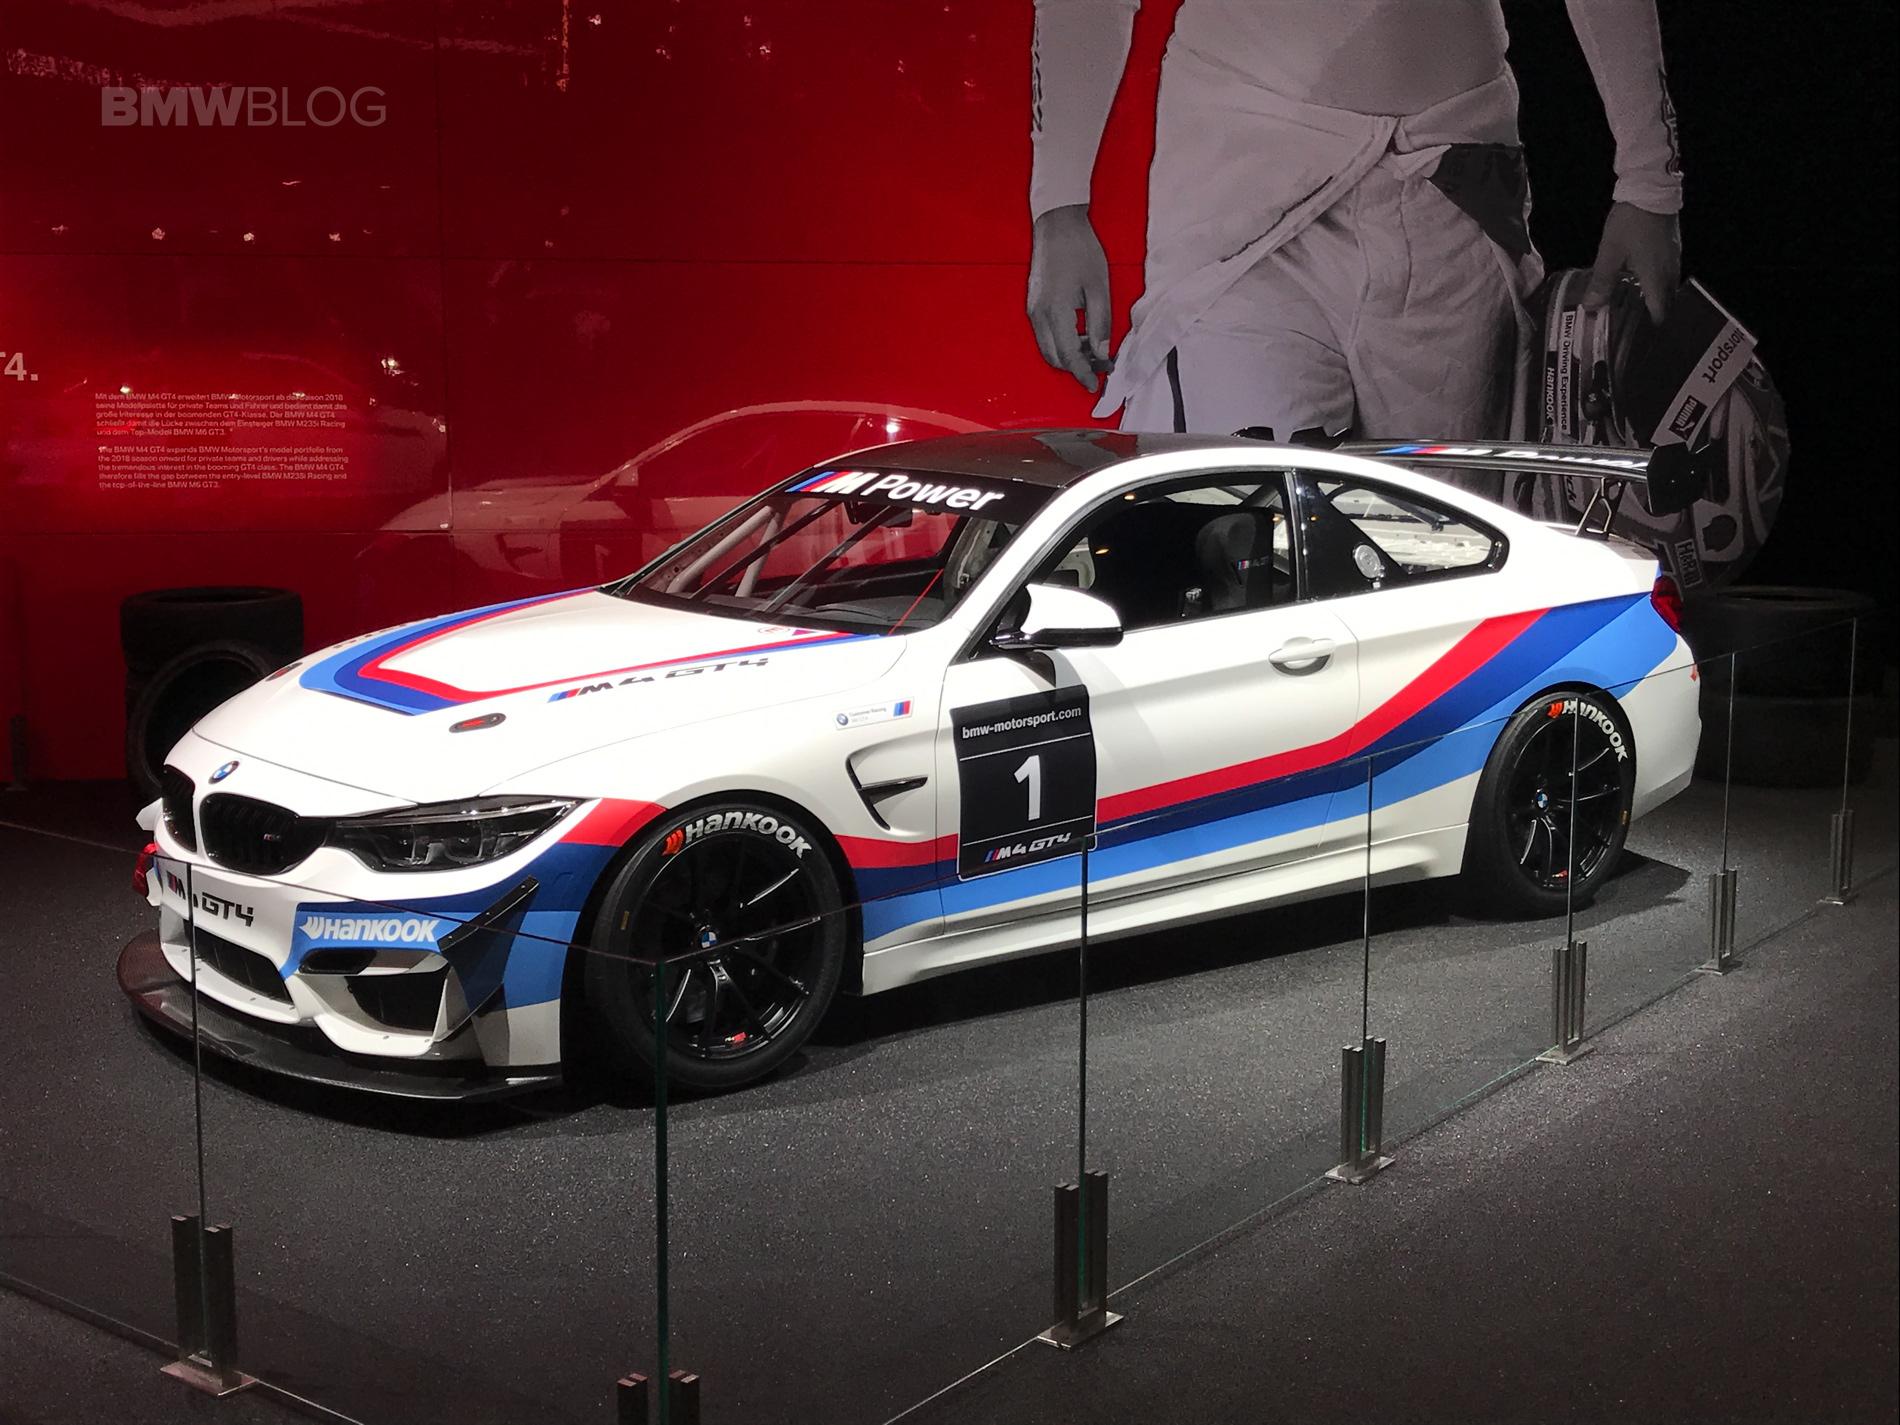 2017 Frankfurt Auto Show Bmw M4 Gt4